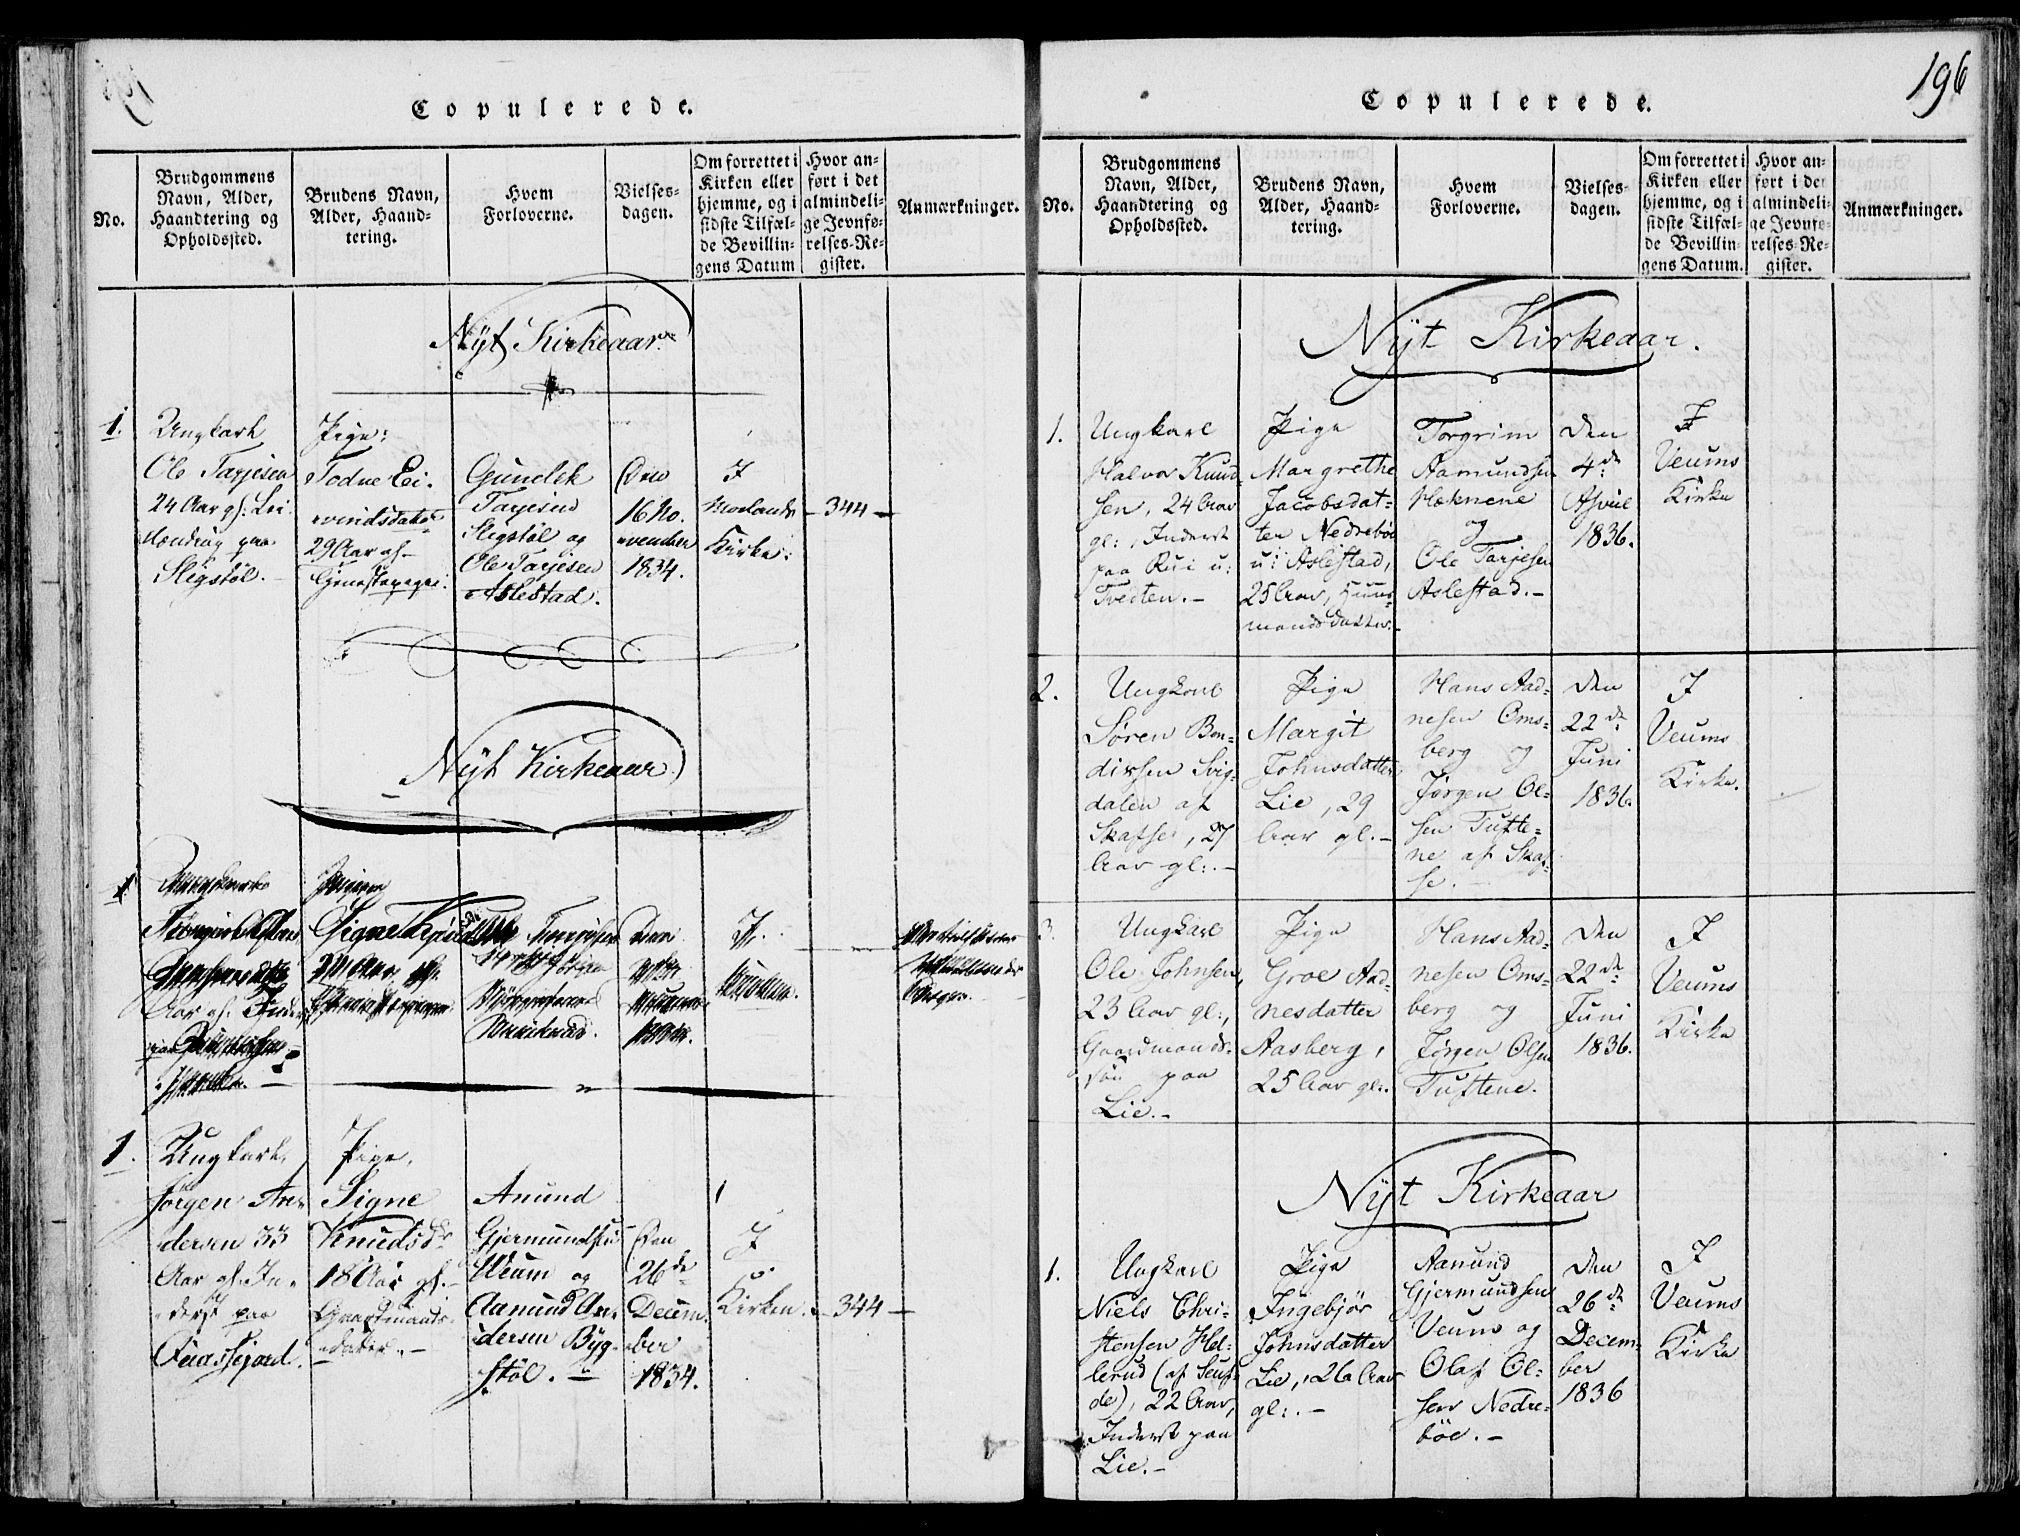 SAKO, Fyresdal kirkebøker, F/Fb/L0001: Ministerialbok nr. II 1, 1815-1854, s. 196